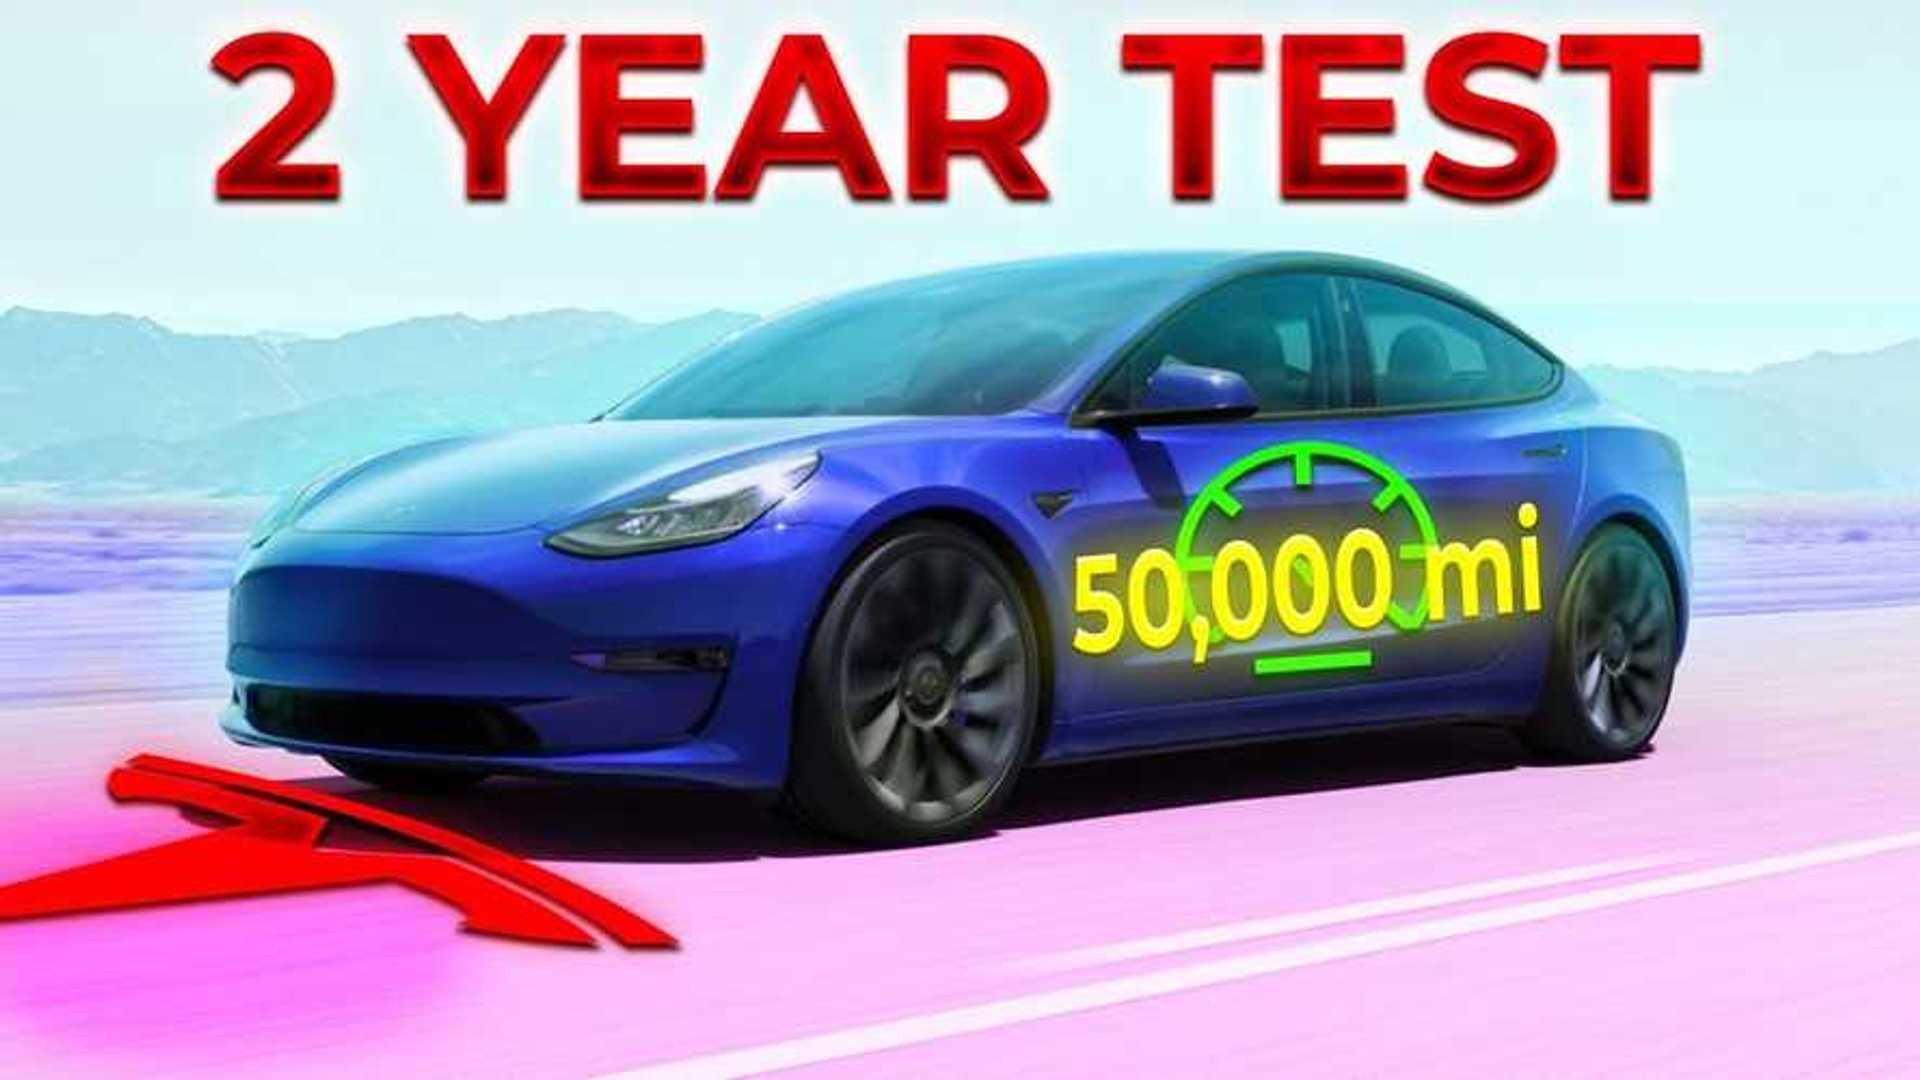 Tesla Model 3 Ownership Review: 2 Years, 50,000 Miles - InsideEVs